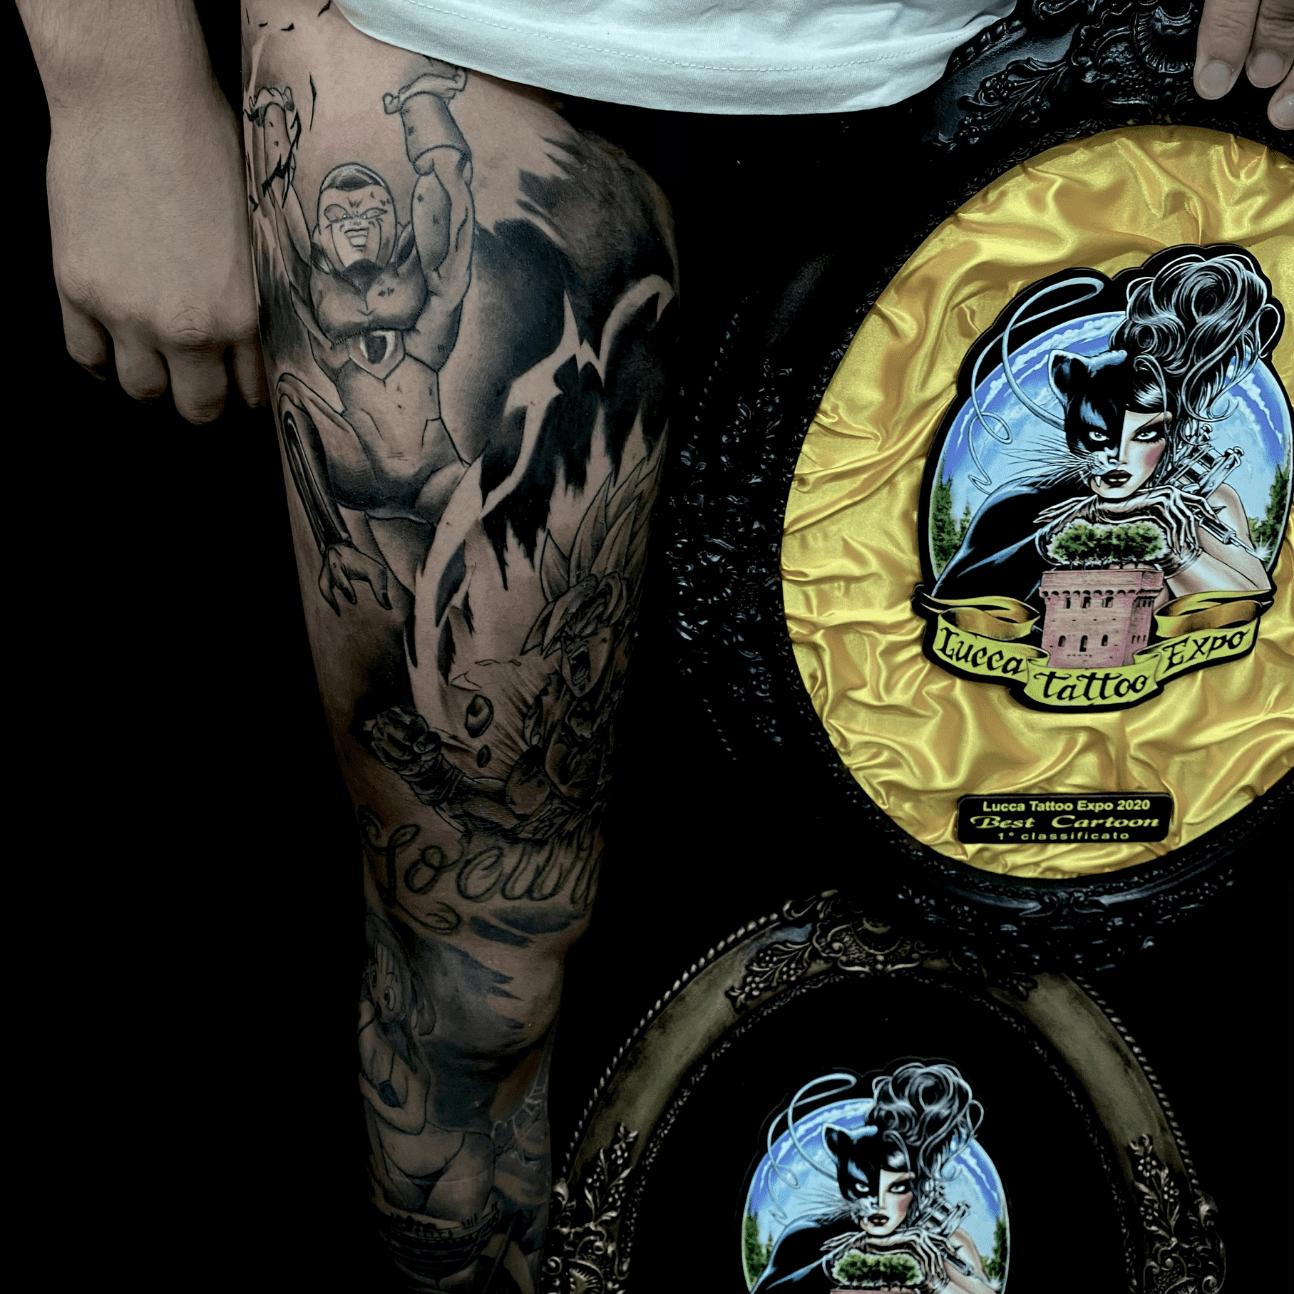 Tatuatore a roma? Contatta Rosco Tattoo